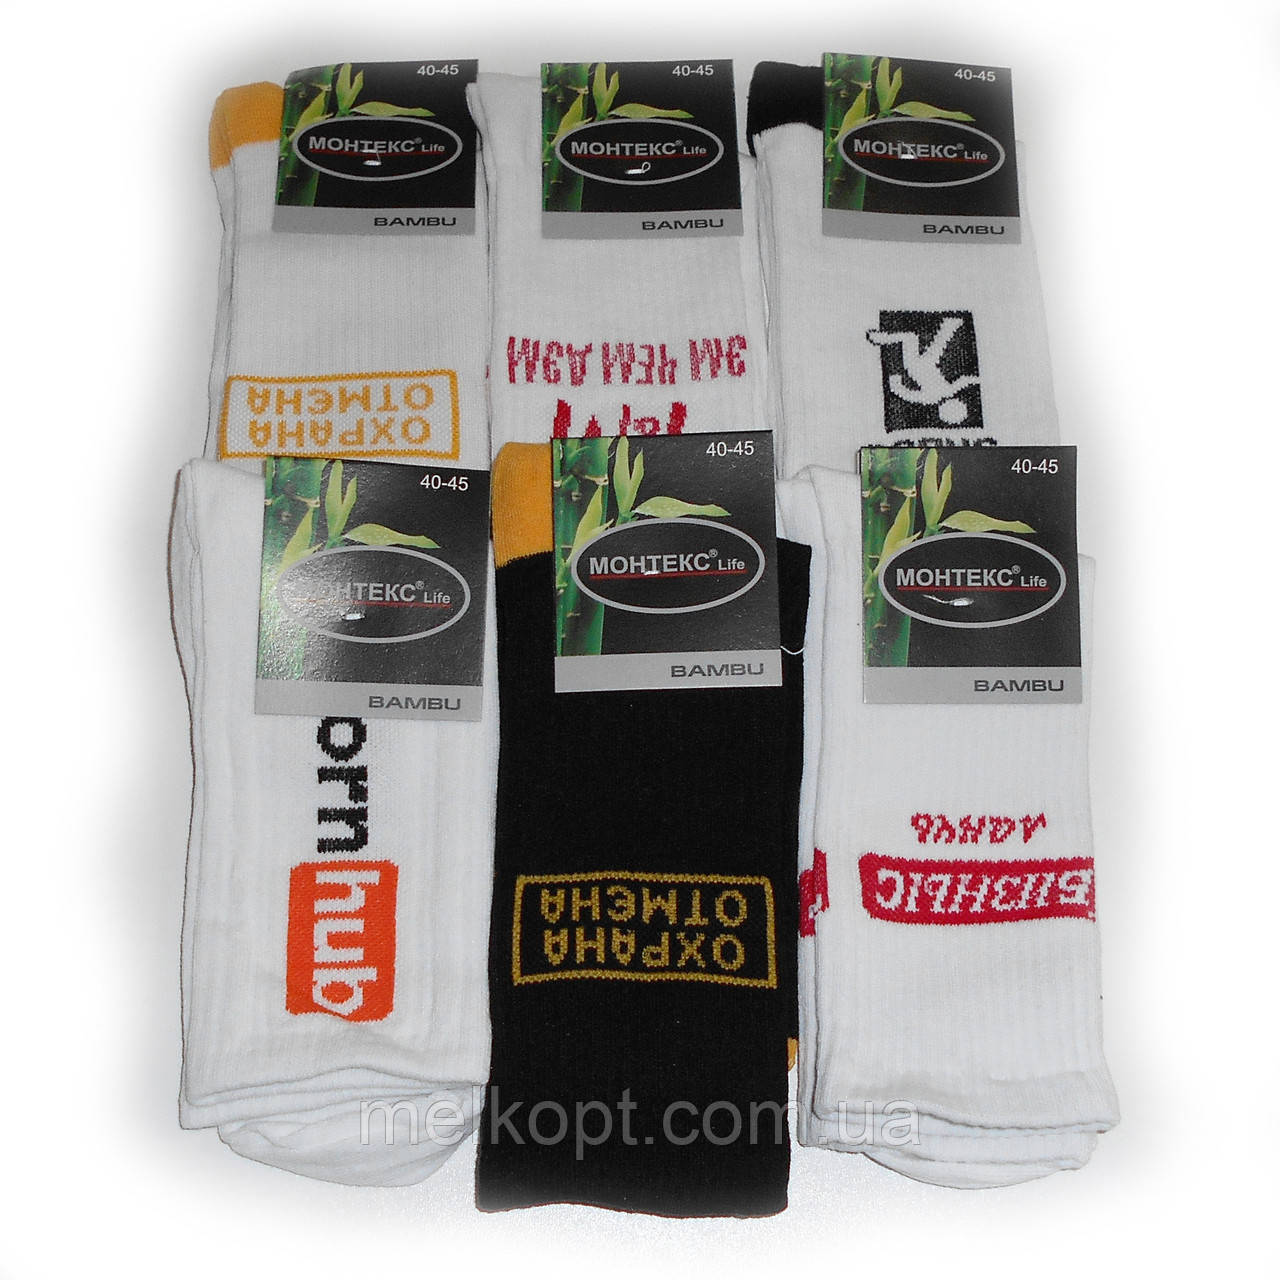 Мужские носки с приколами Мантекс - 11,50 грн./пара (Life, ассорти)